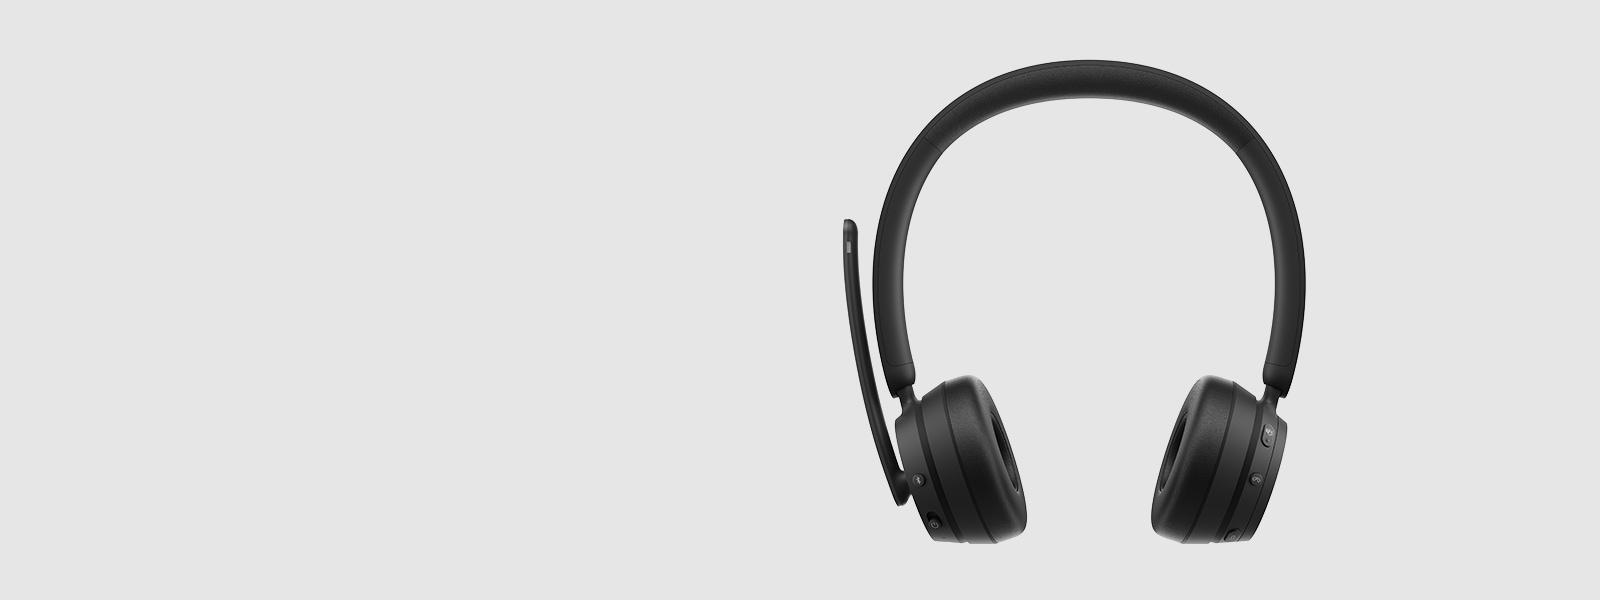 A Microsoft Modern Wireless Headset